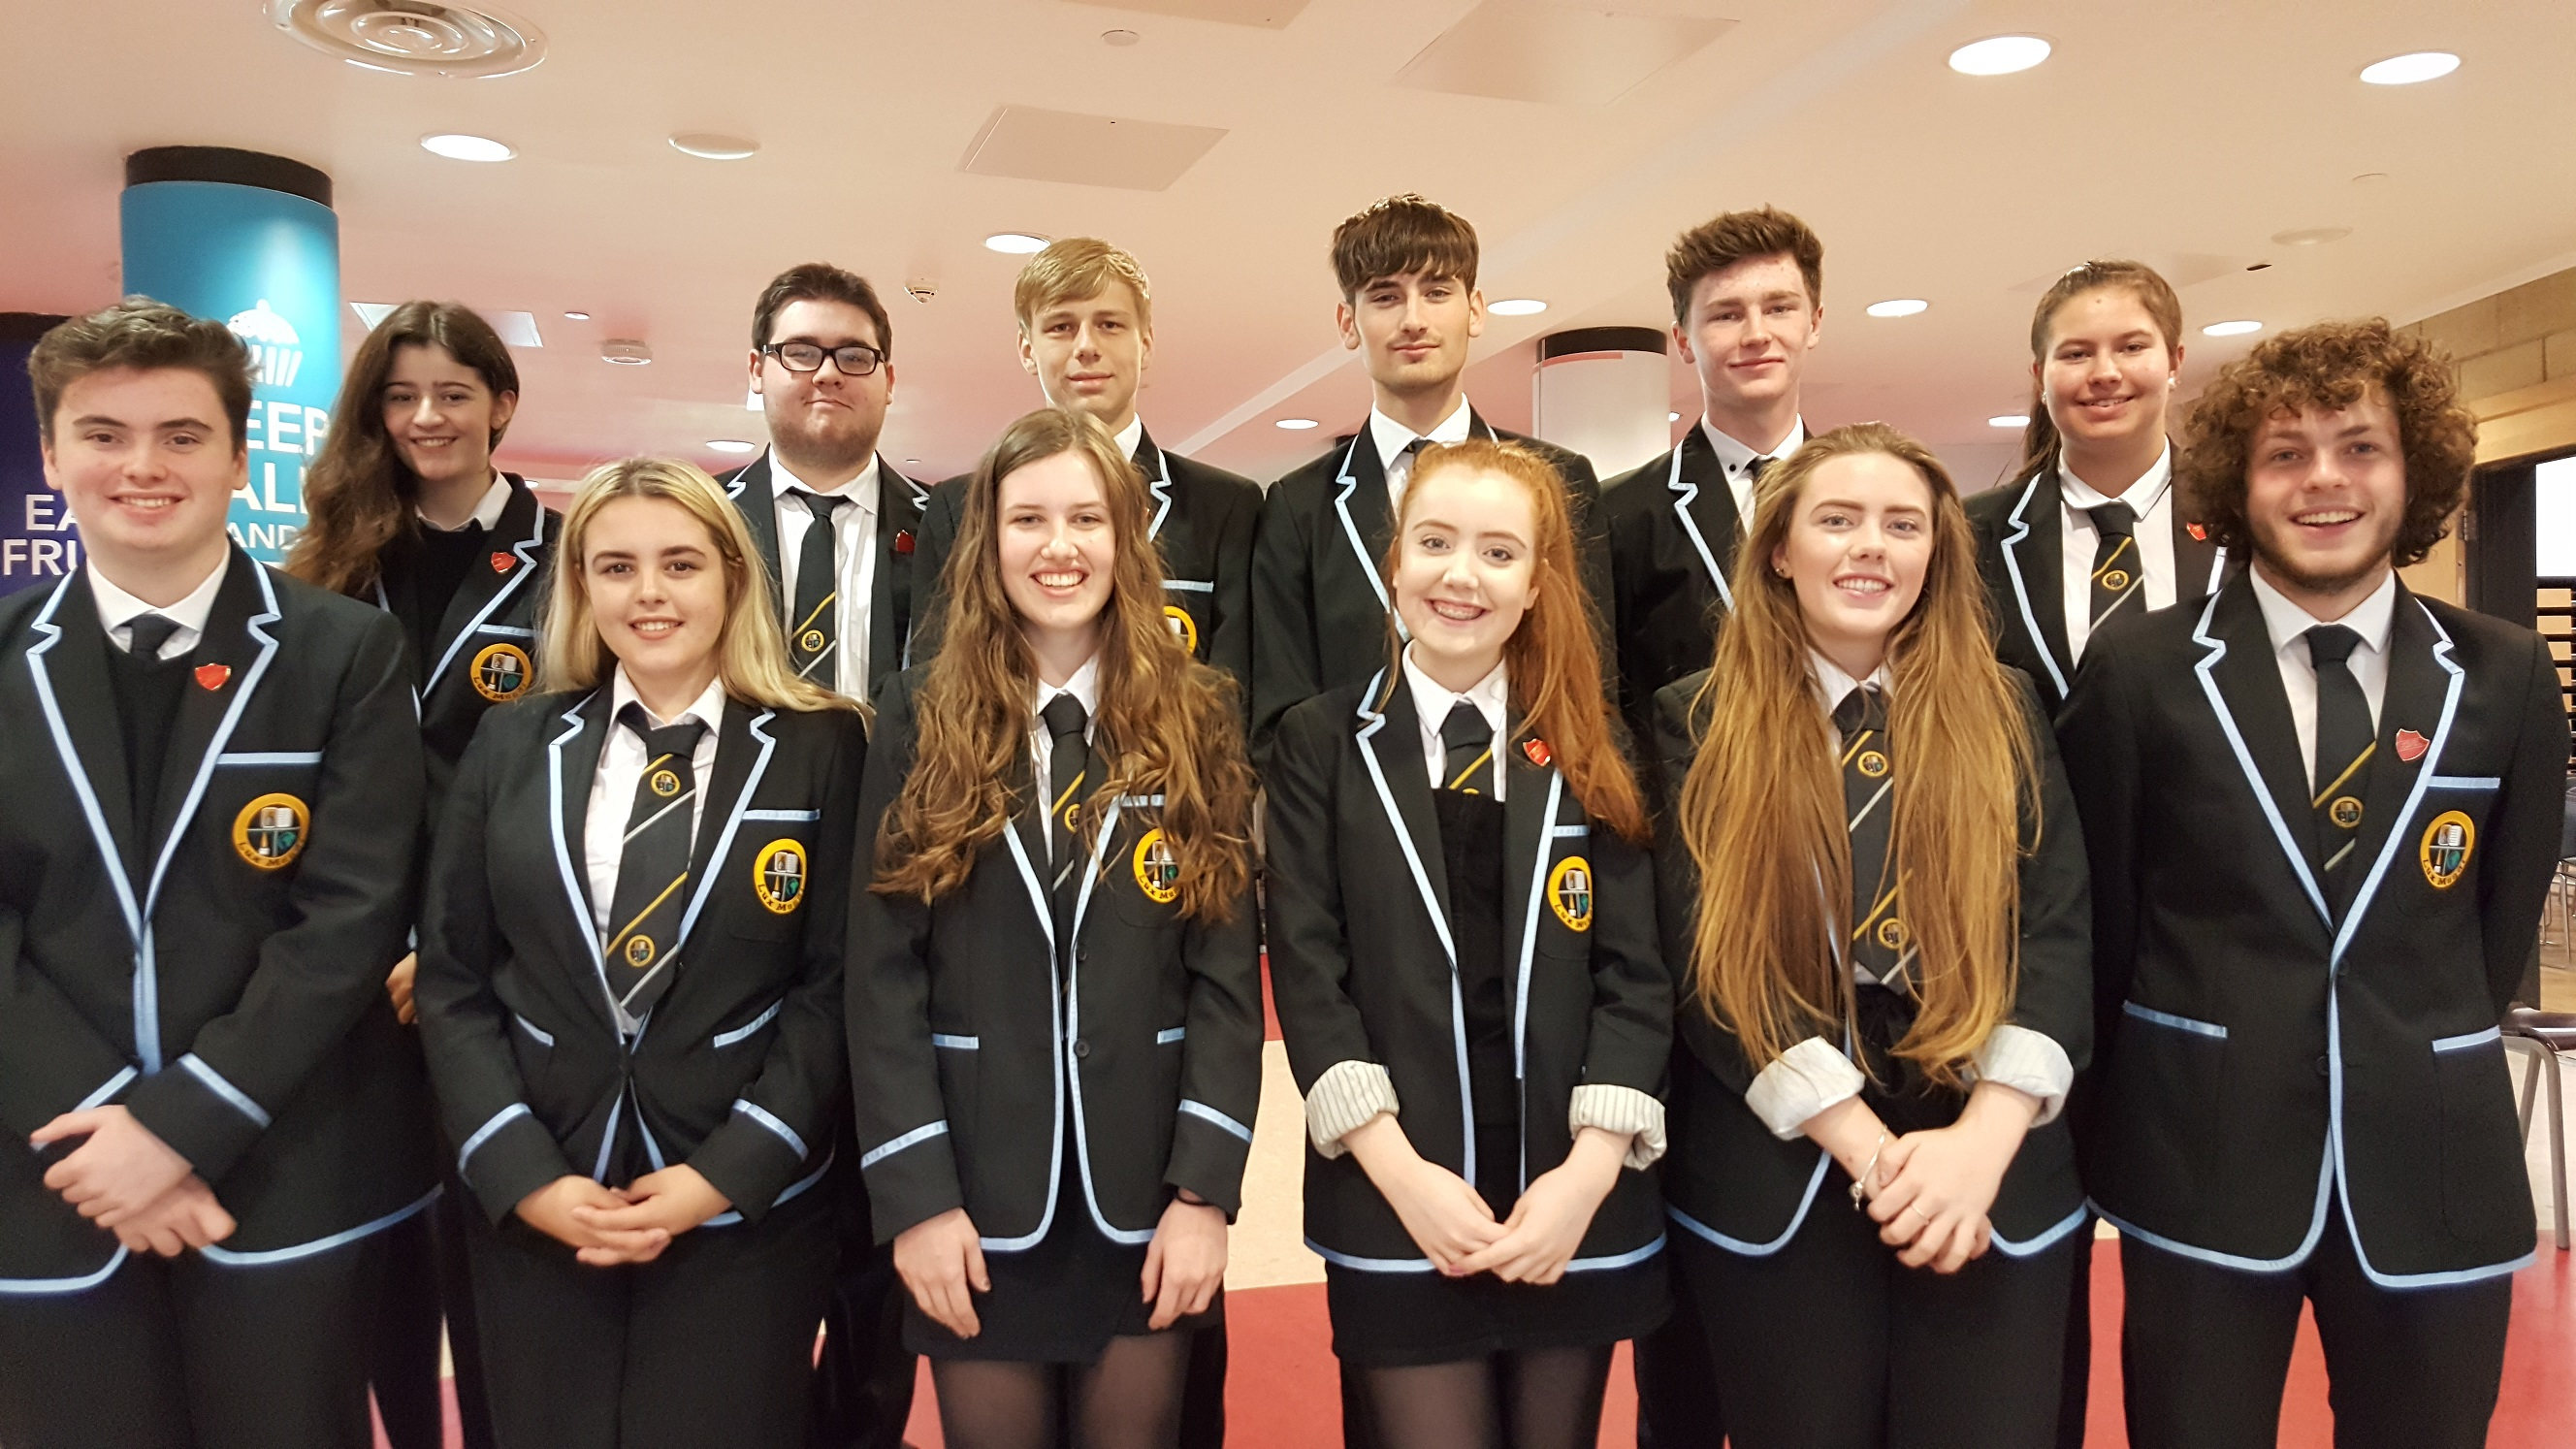 Uniform – St Matthews Academy